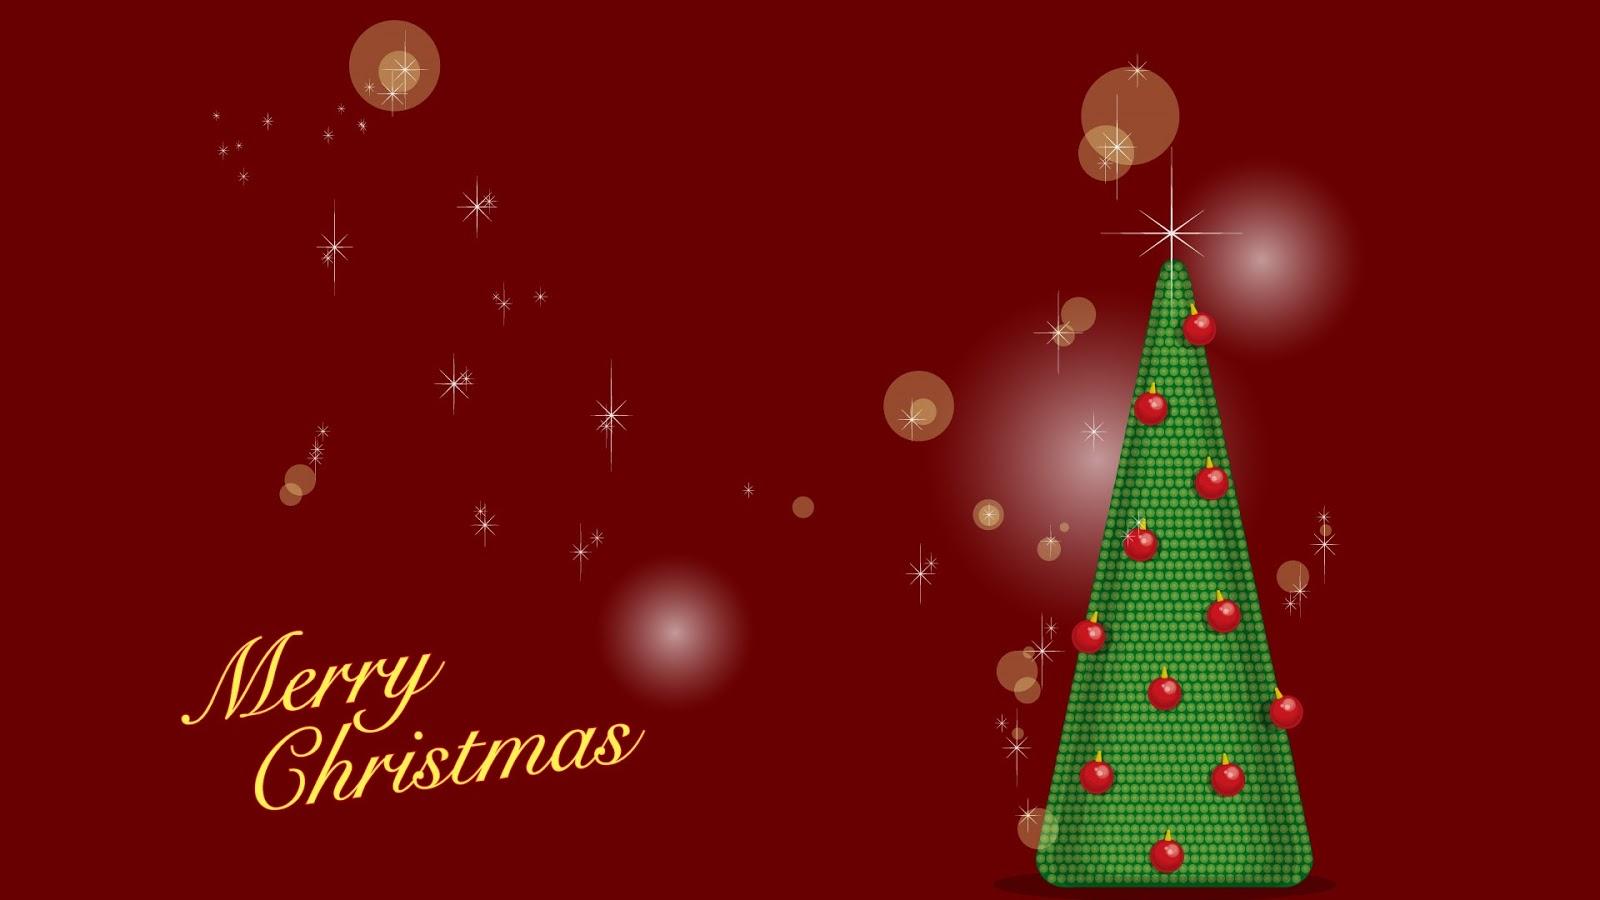 Christmas HD wallpapers 1080p | HD Wallpapers (High ...